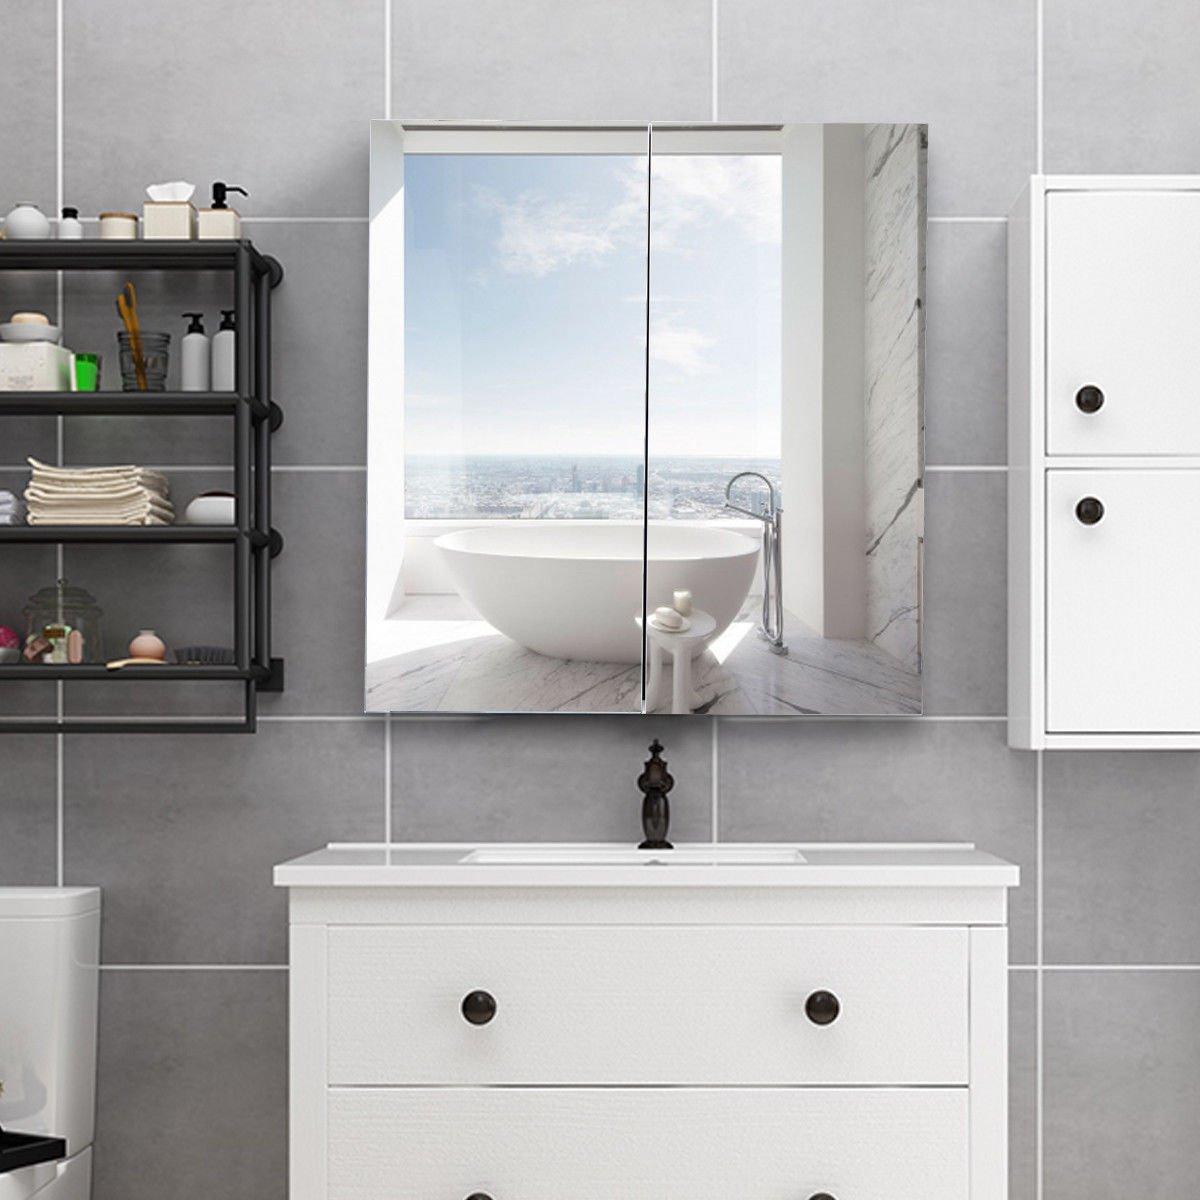 Cheap Argos Mirrored Bathroom Cabinet Find Argos Mirrored Bathroom Cabinet Deals On Line At Alibaba Com